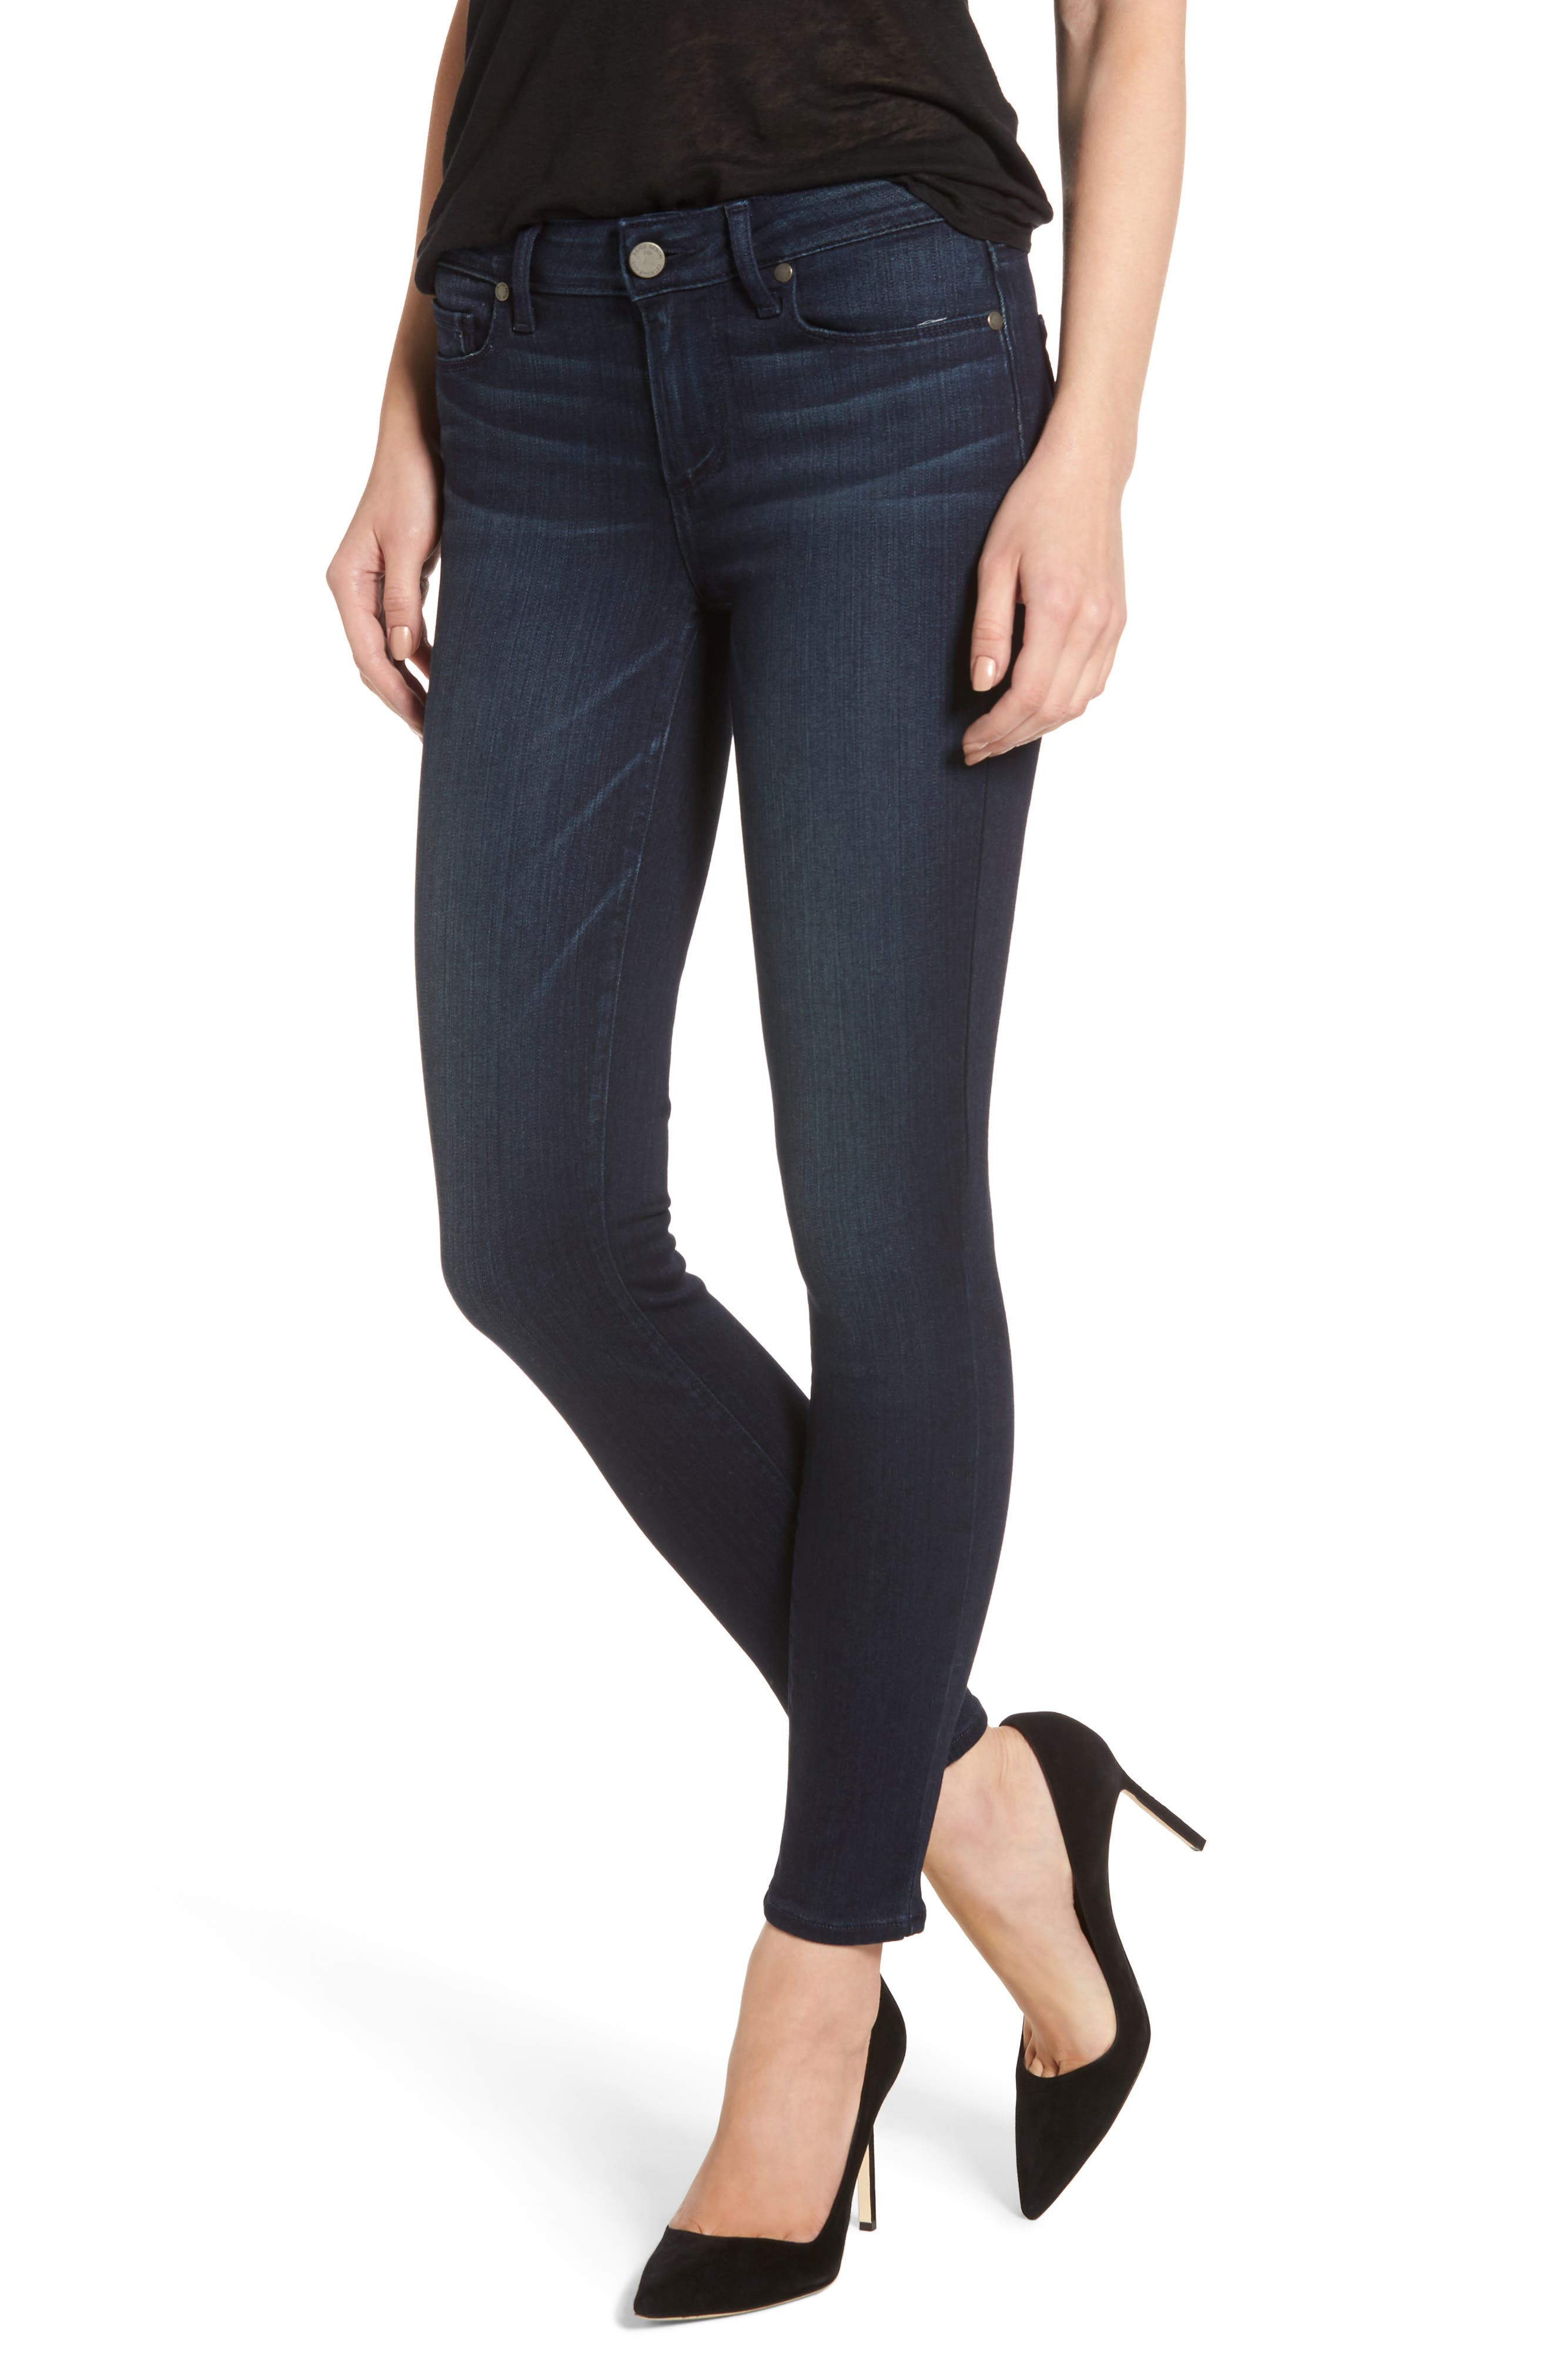 Transcend - Verdugo Ankle Skinny Jeans,                             Main thumbnail 1, color,                             Midlake